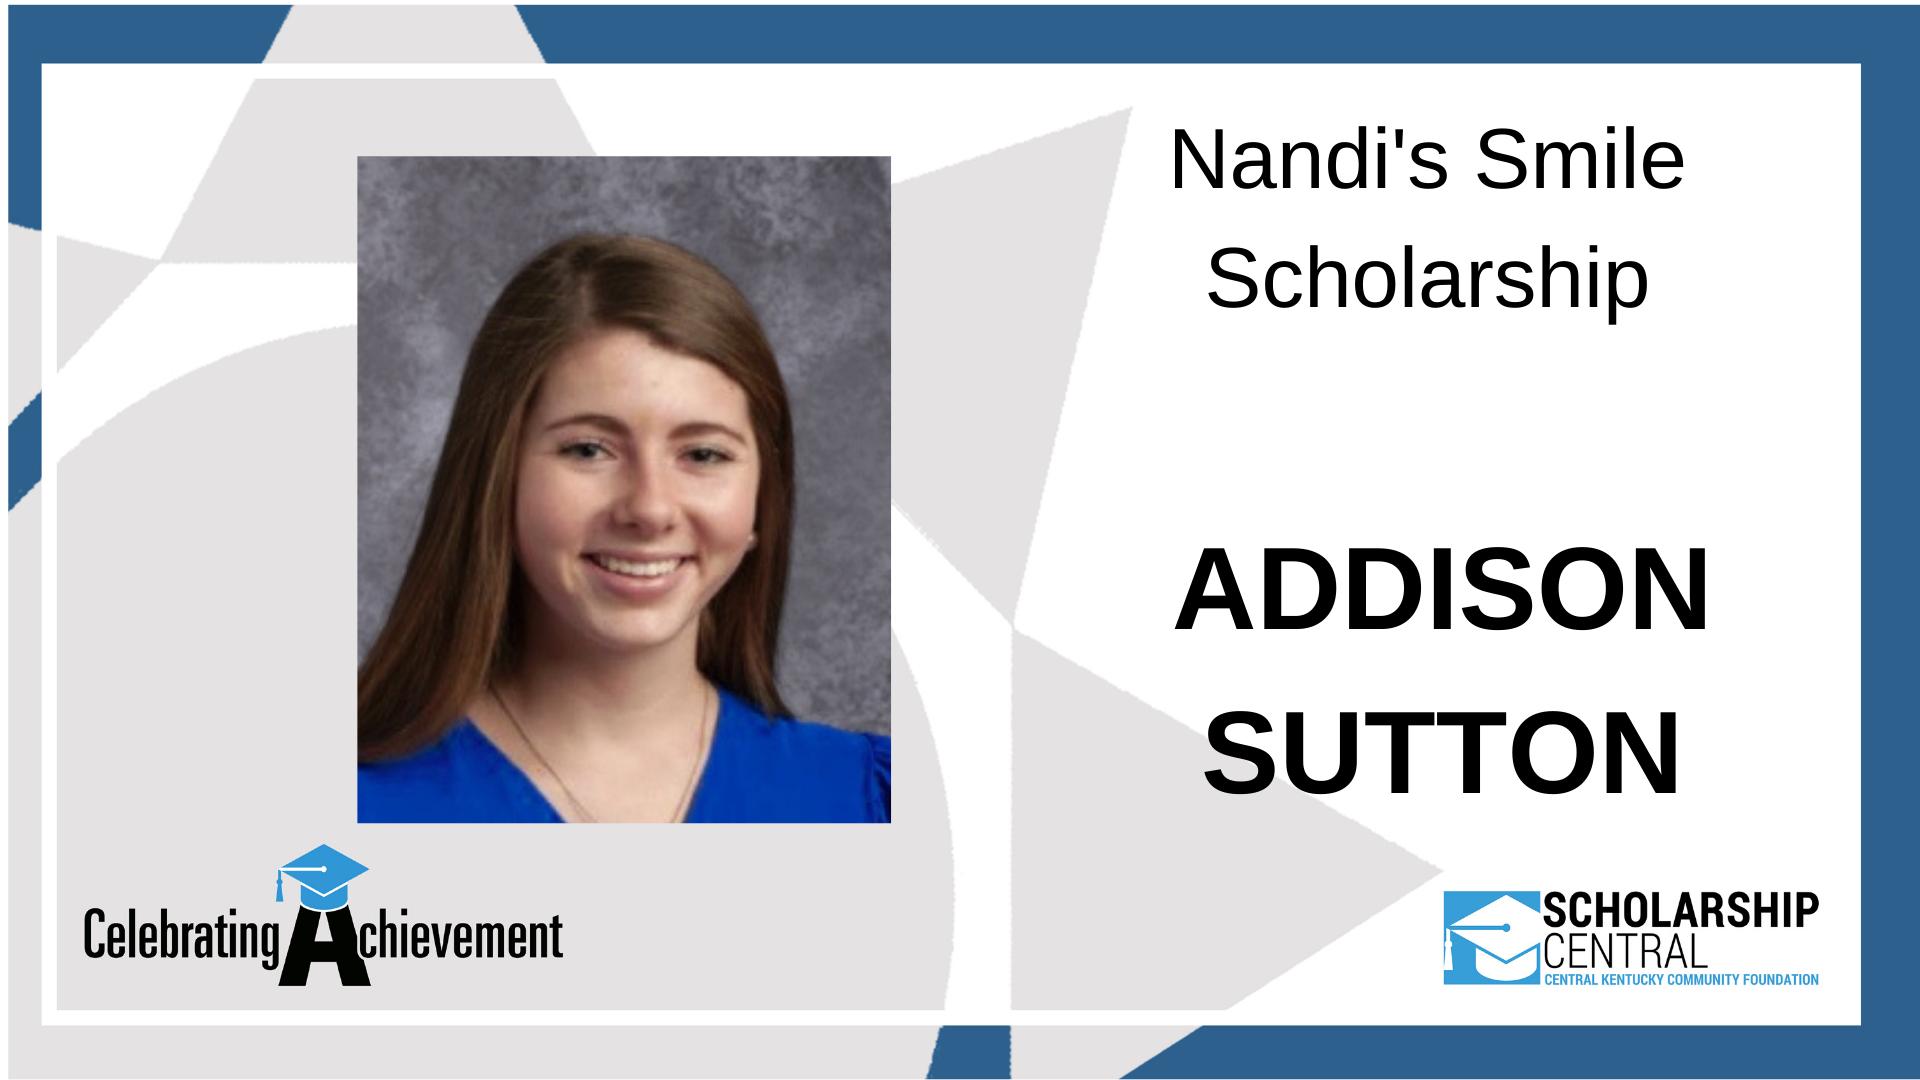 Nandis Smile Scholarship1